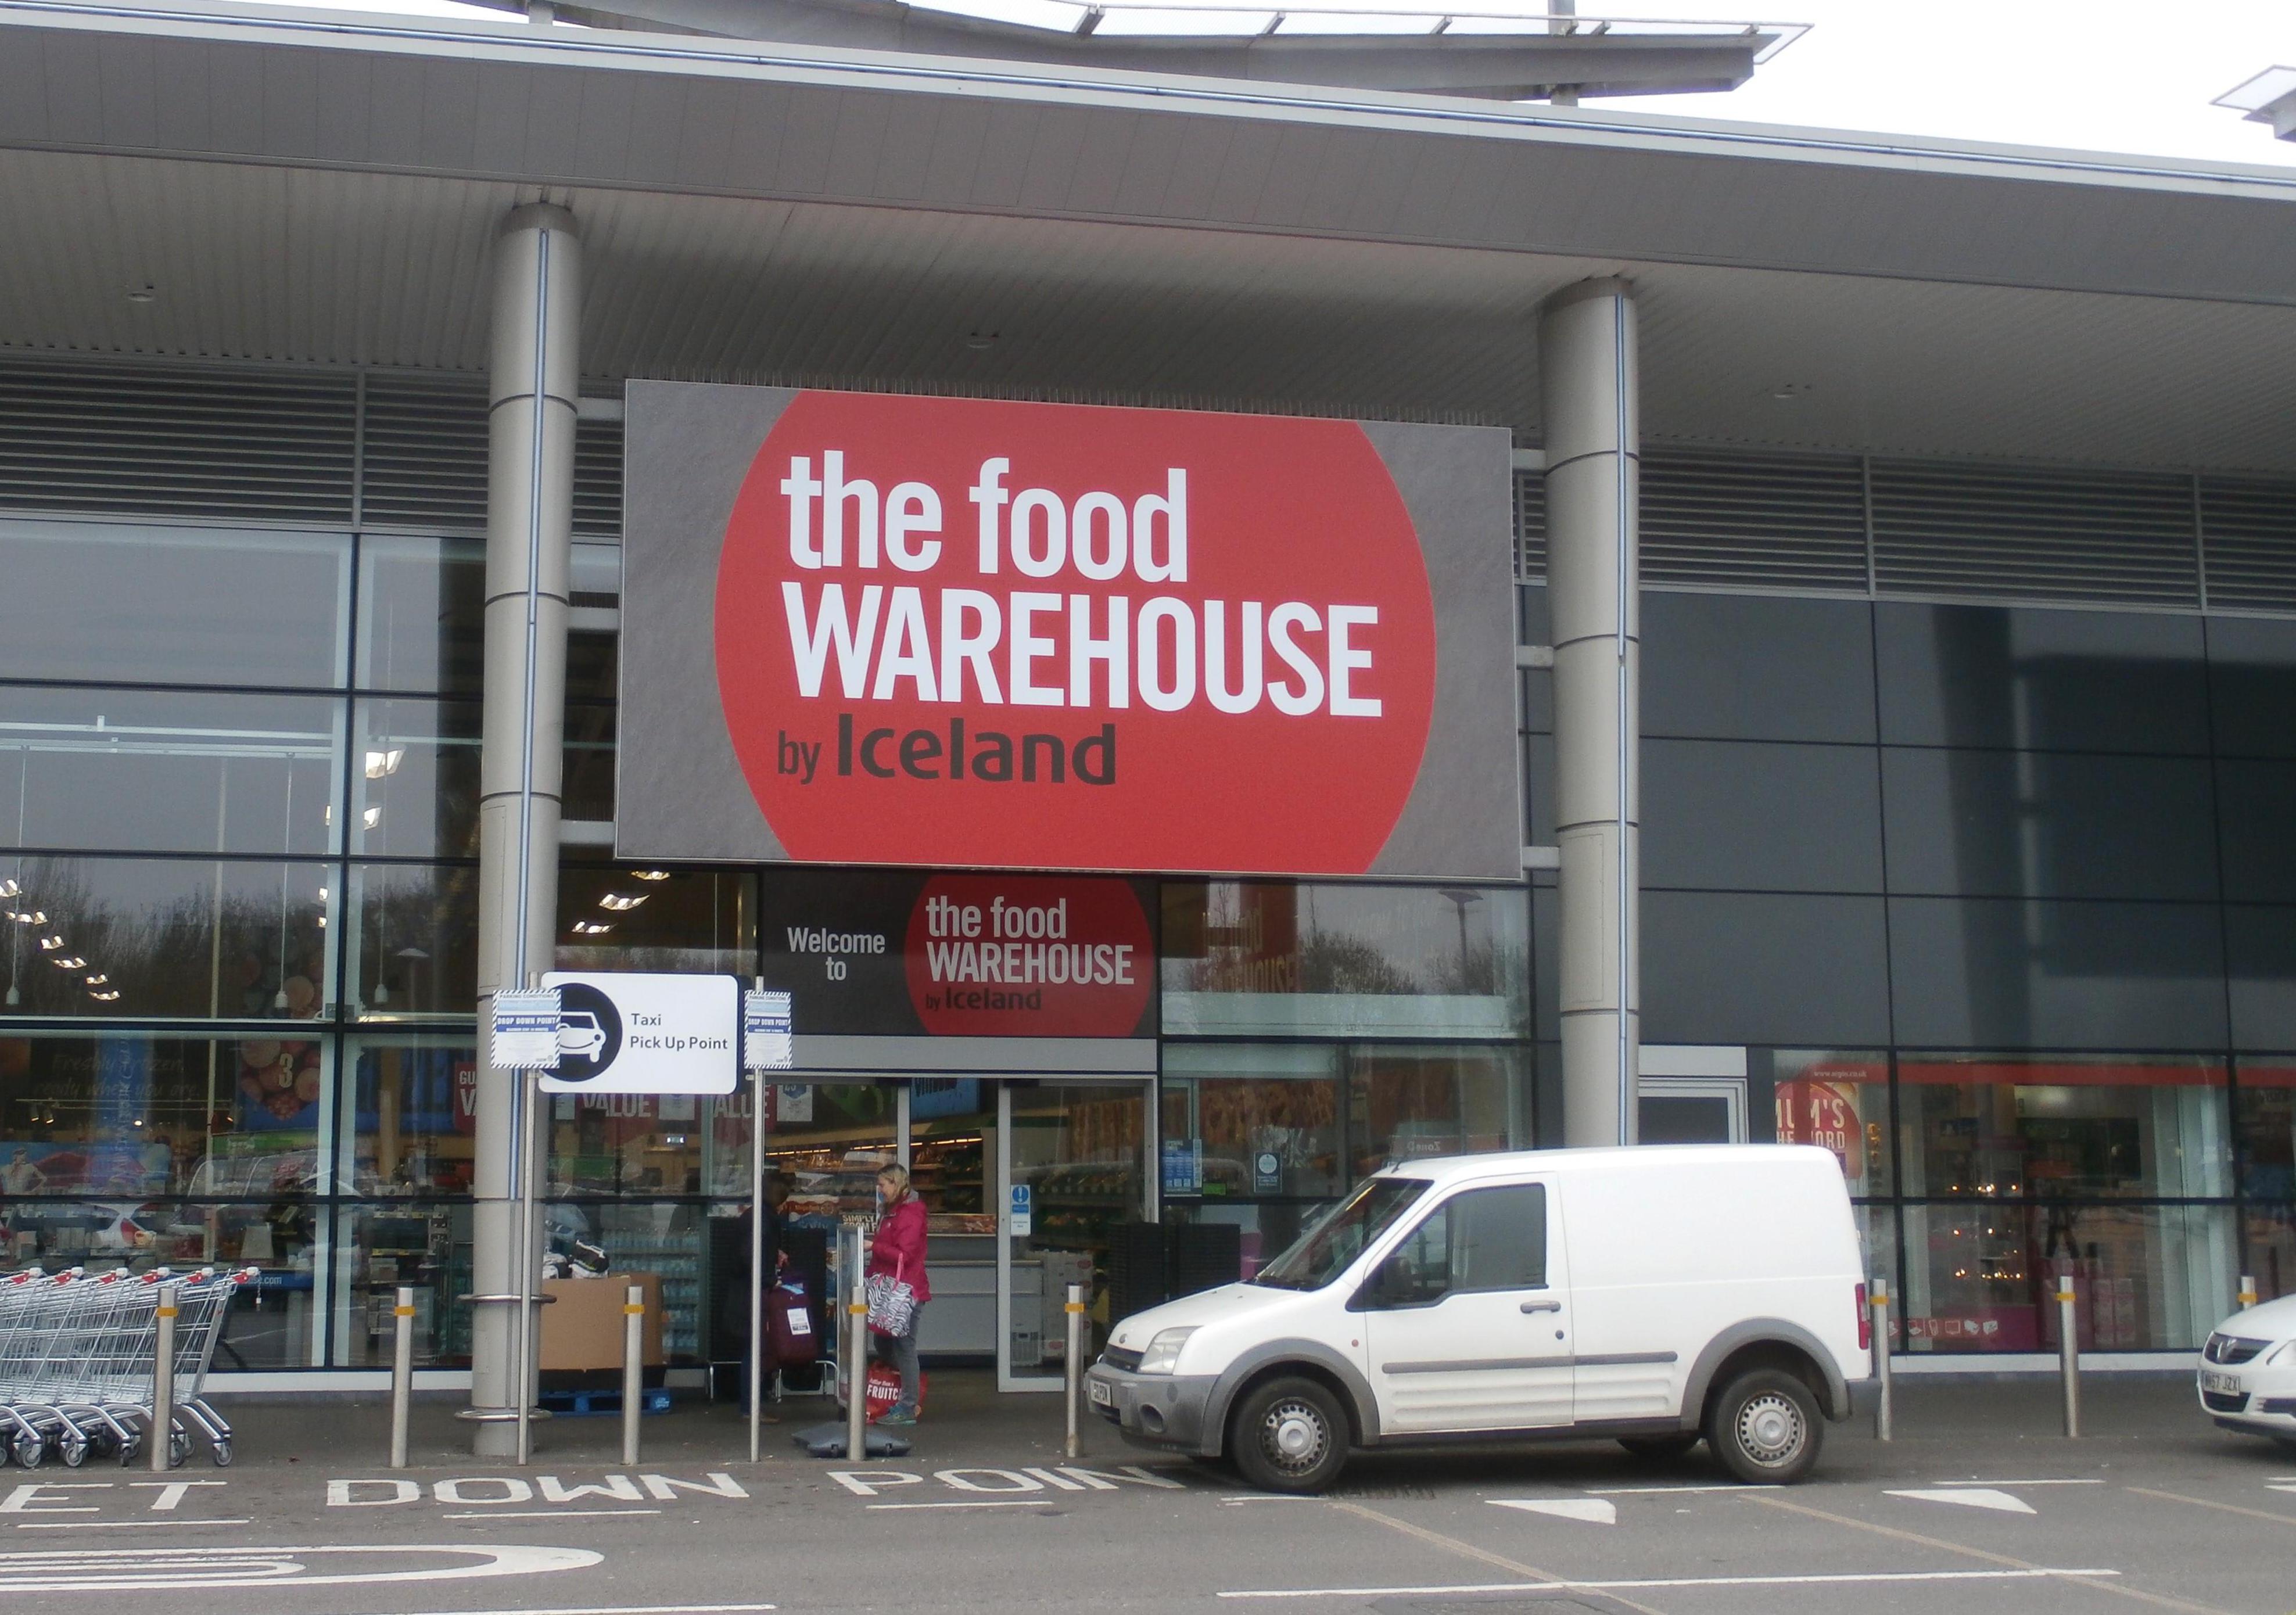 Food Warehouse bristol.jpg